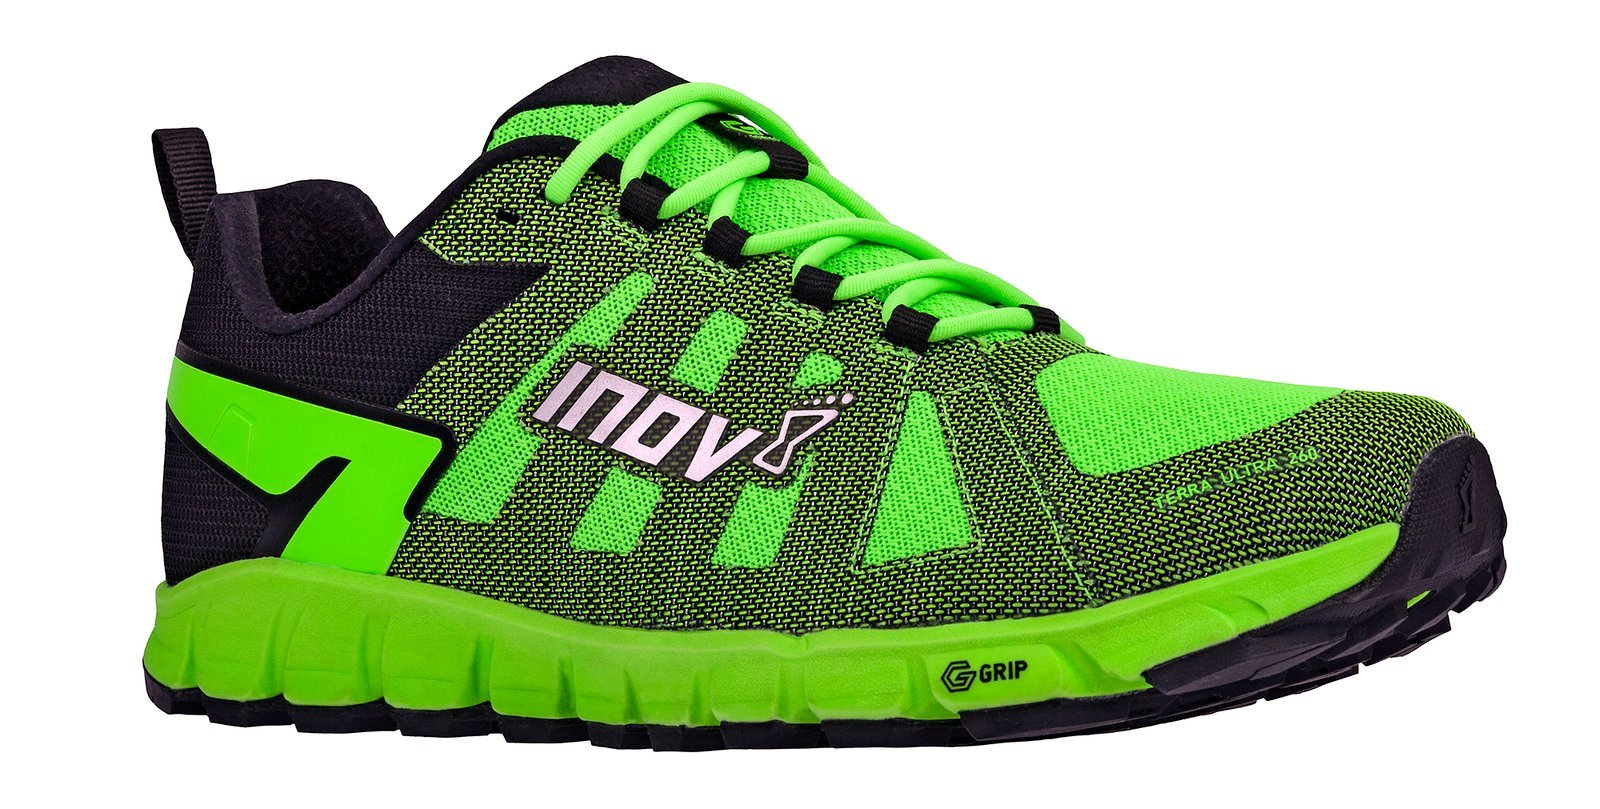 Inov-8 Unisex Terraultra G 260 Trail Running Shoes (M5.5/ W7) Green/Black by Inov-8